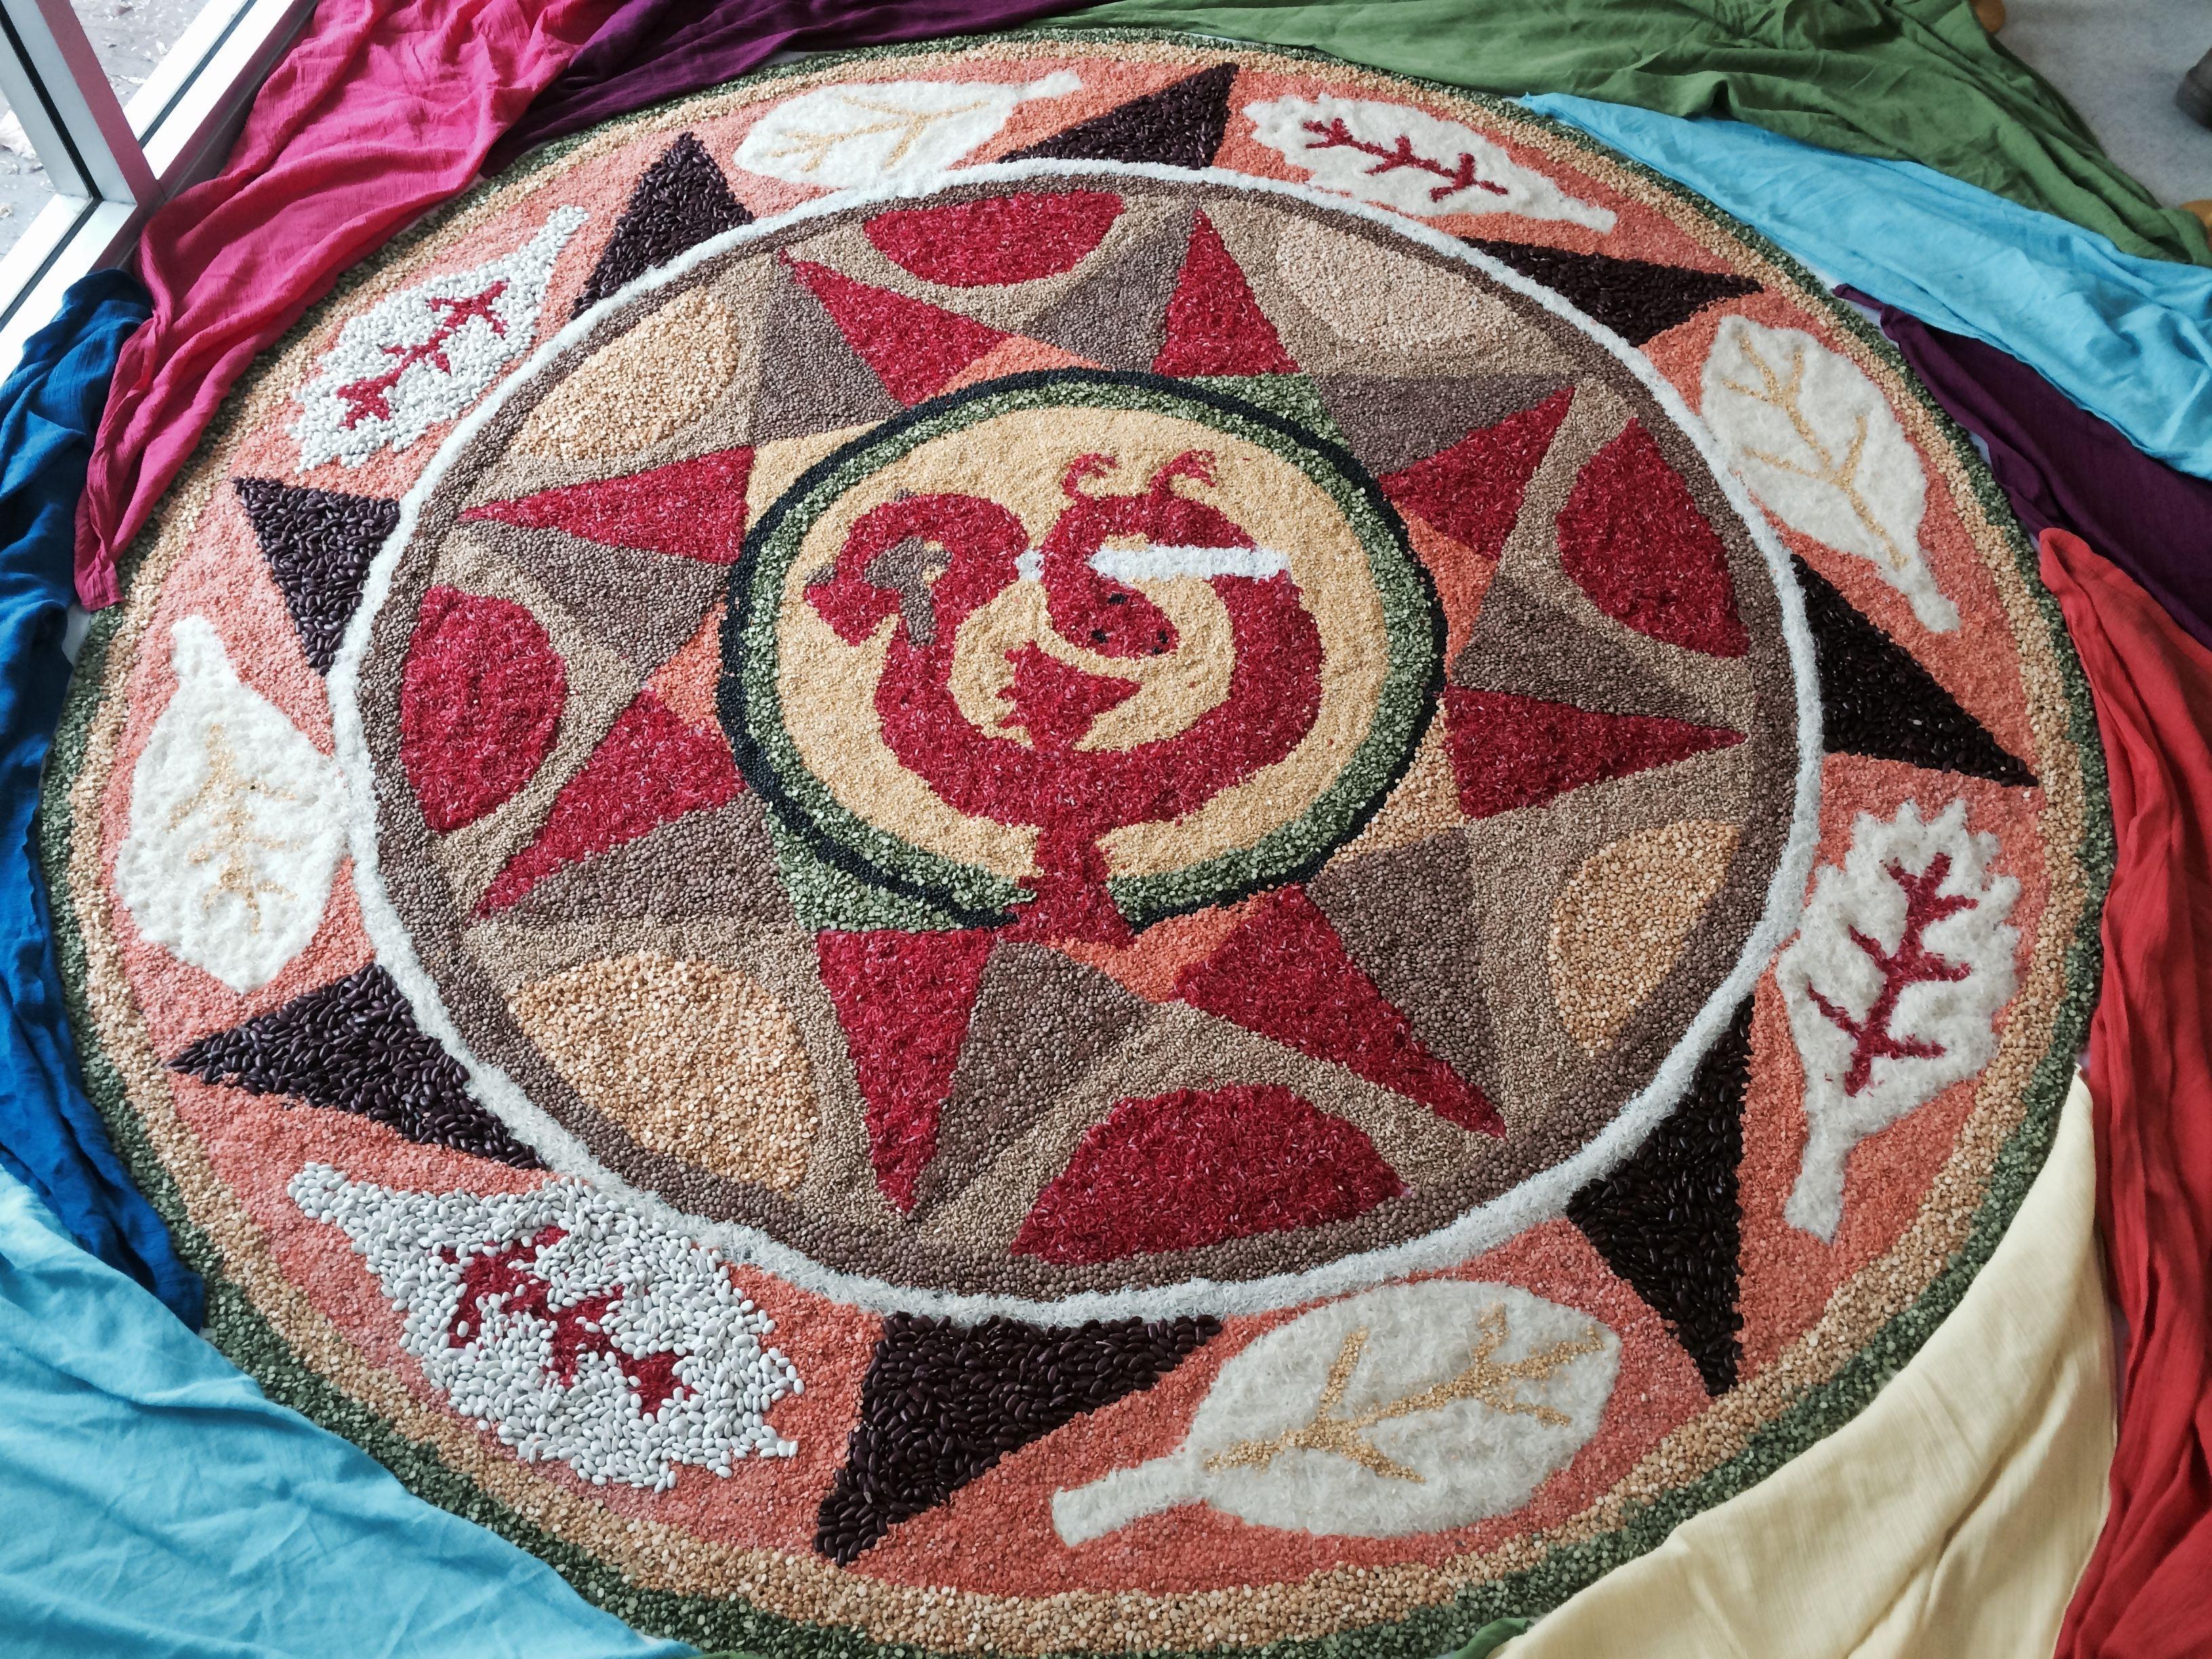 Mandala Made With Grains